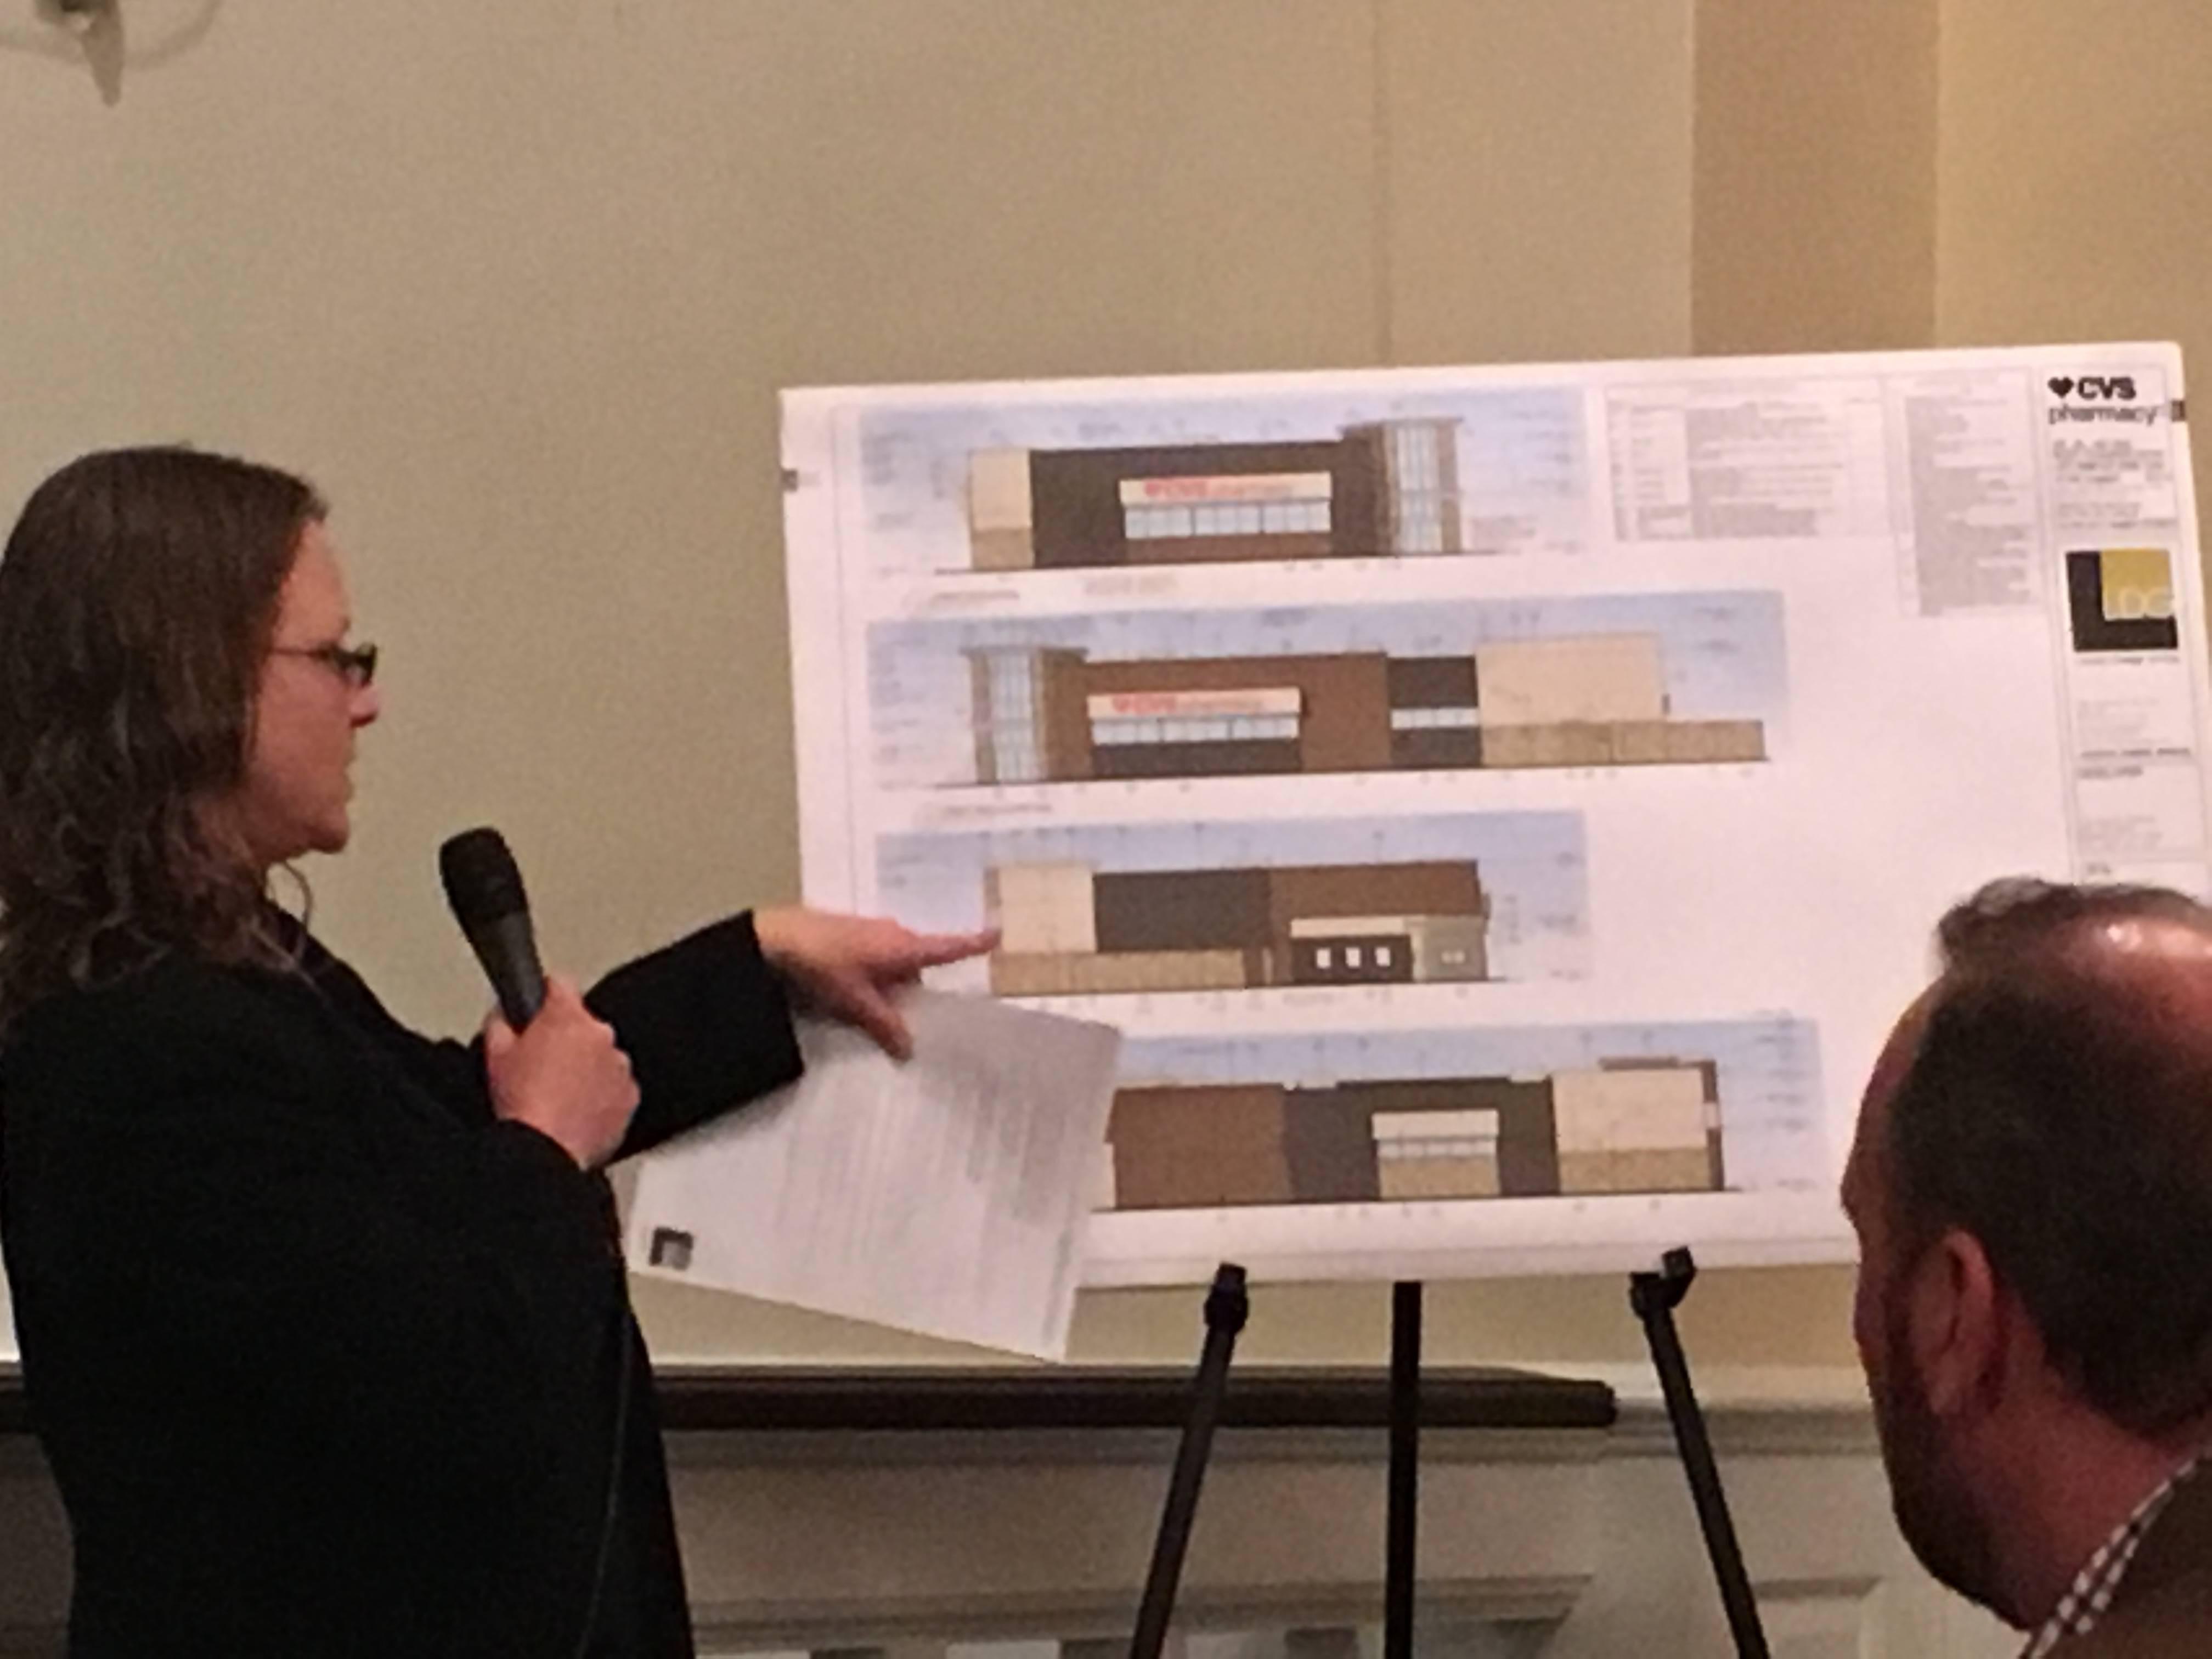 westfield planning board approves cvs pharmacy application